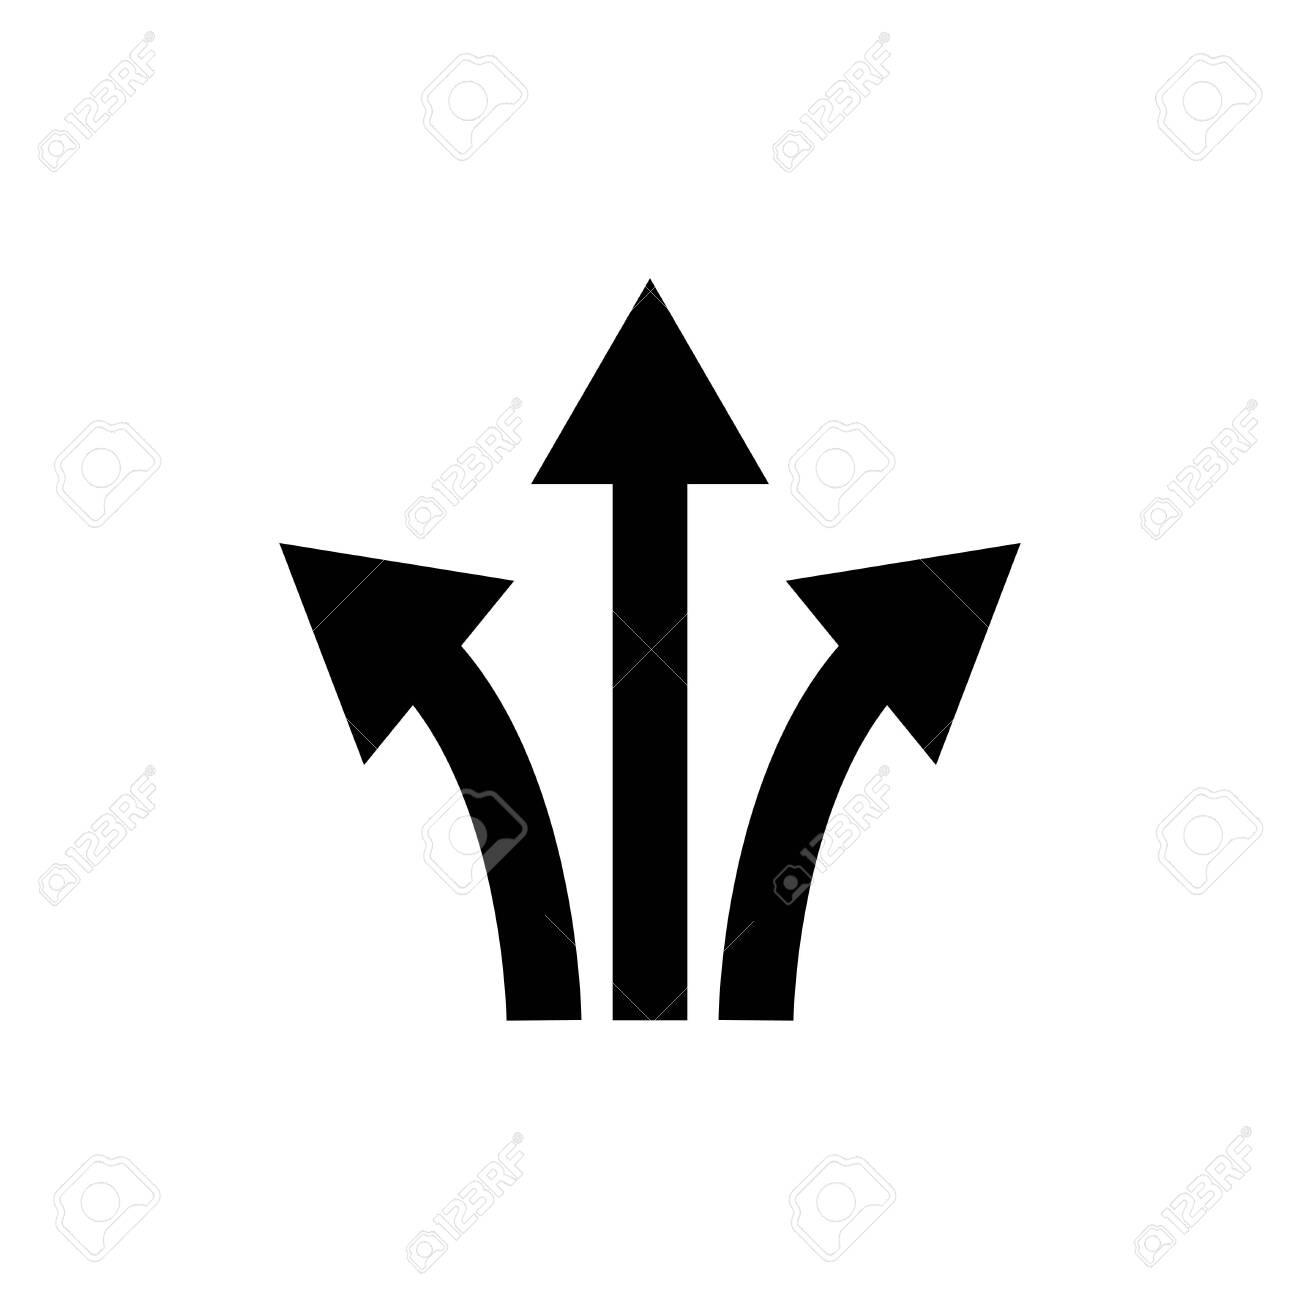 three way direction arrow sign.icon vector graphic design illustration - 145478912